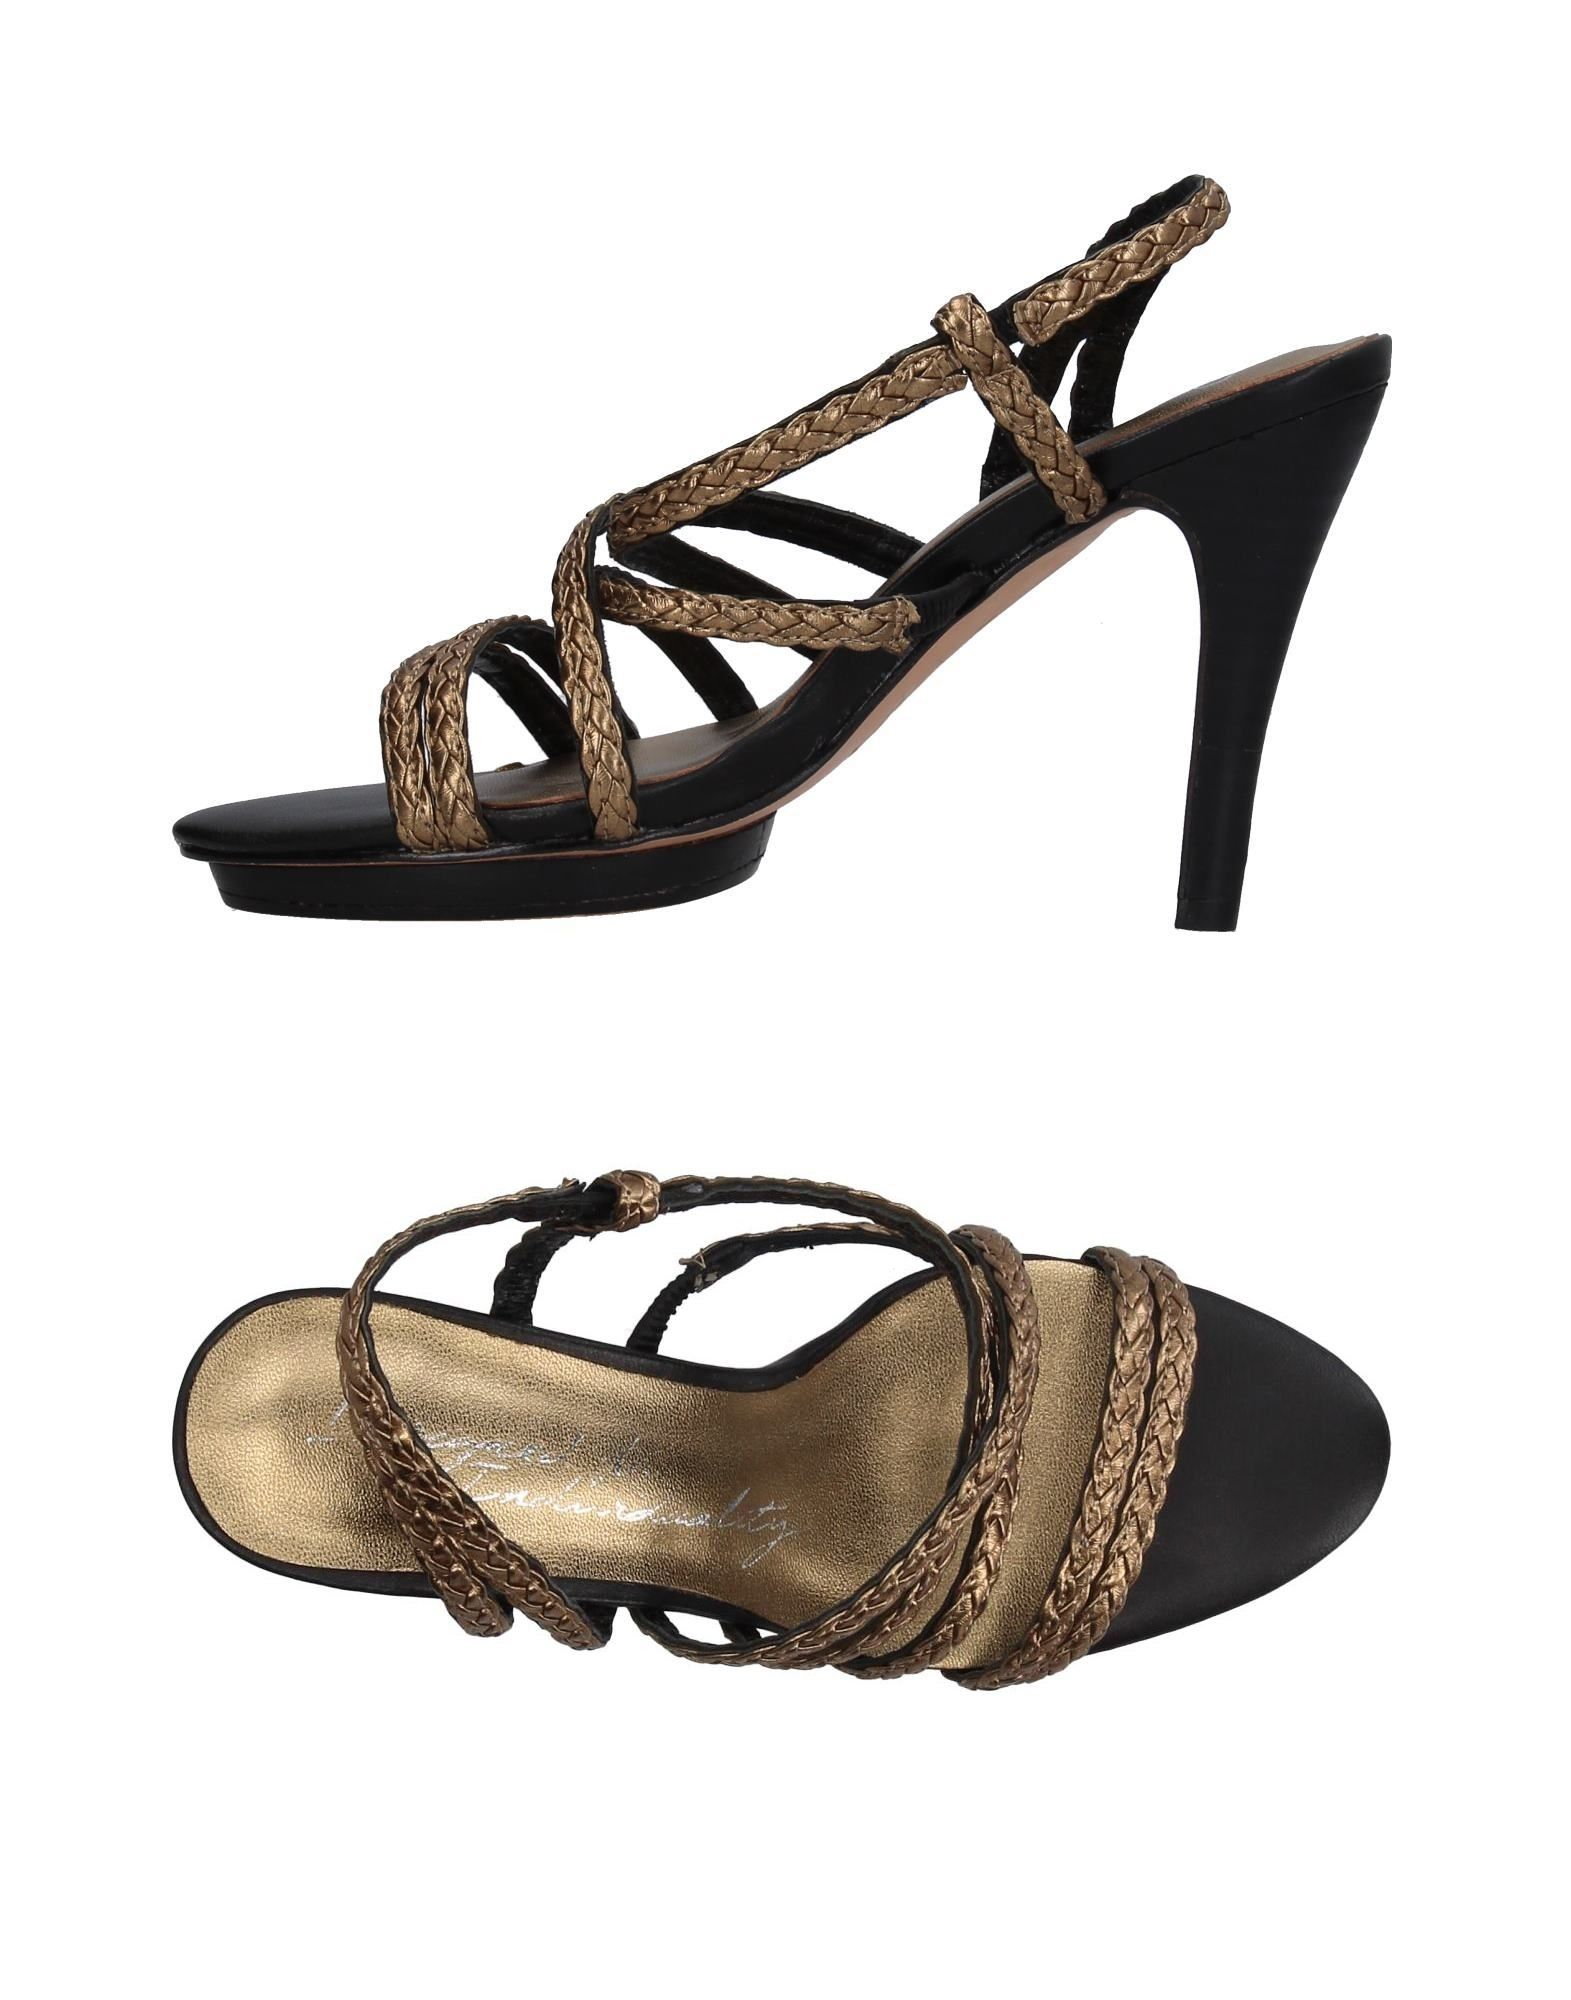 Sandales Mi/Mai Femme - Sandales Mi/Mai sur